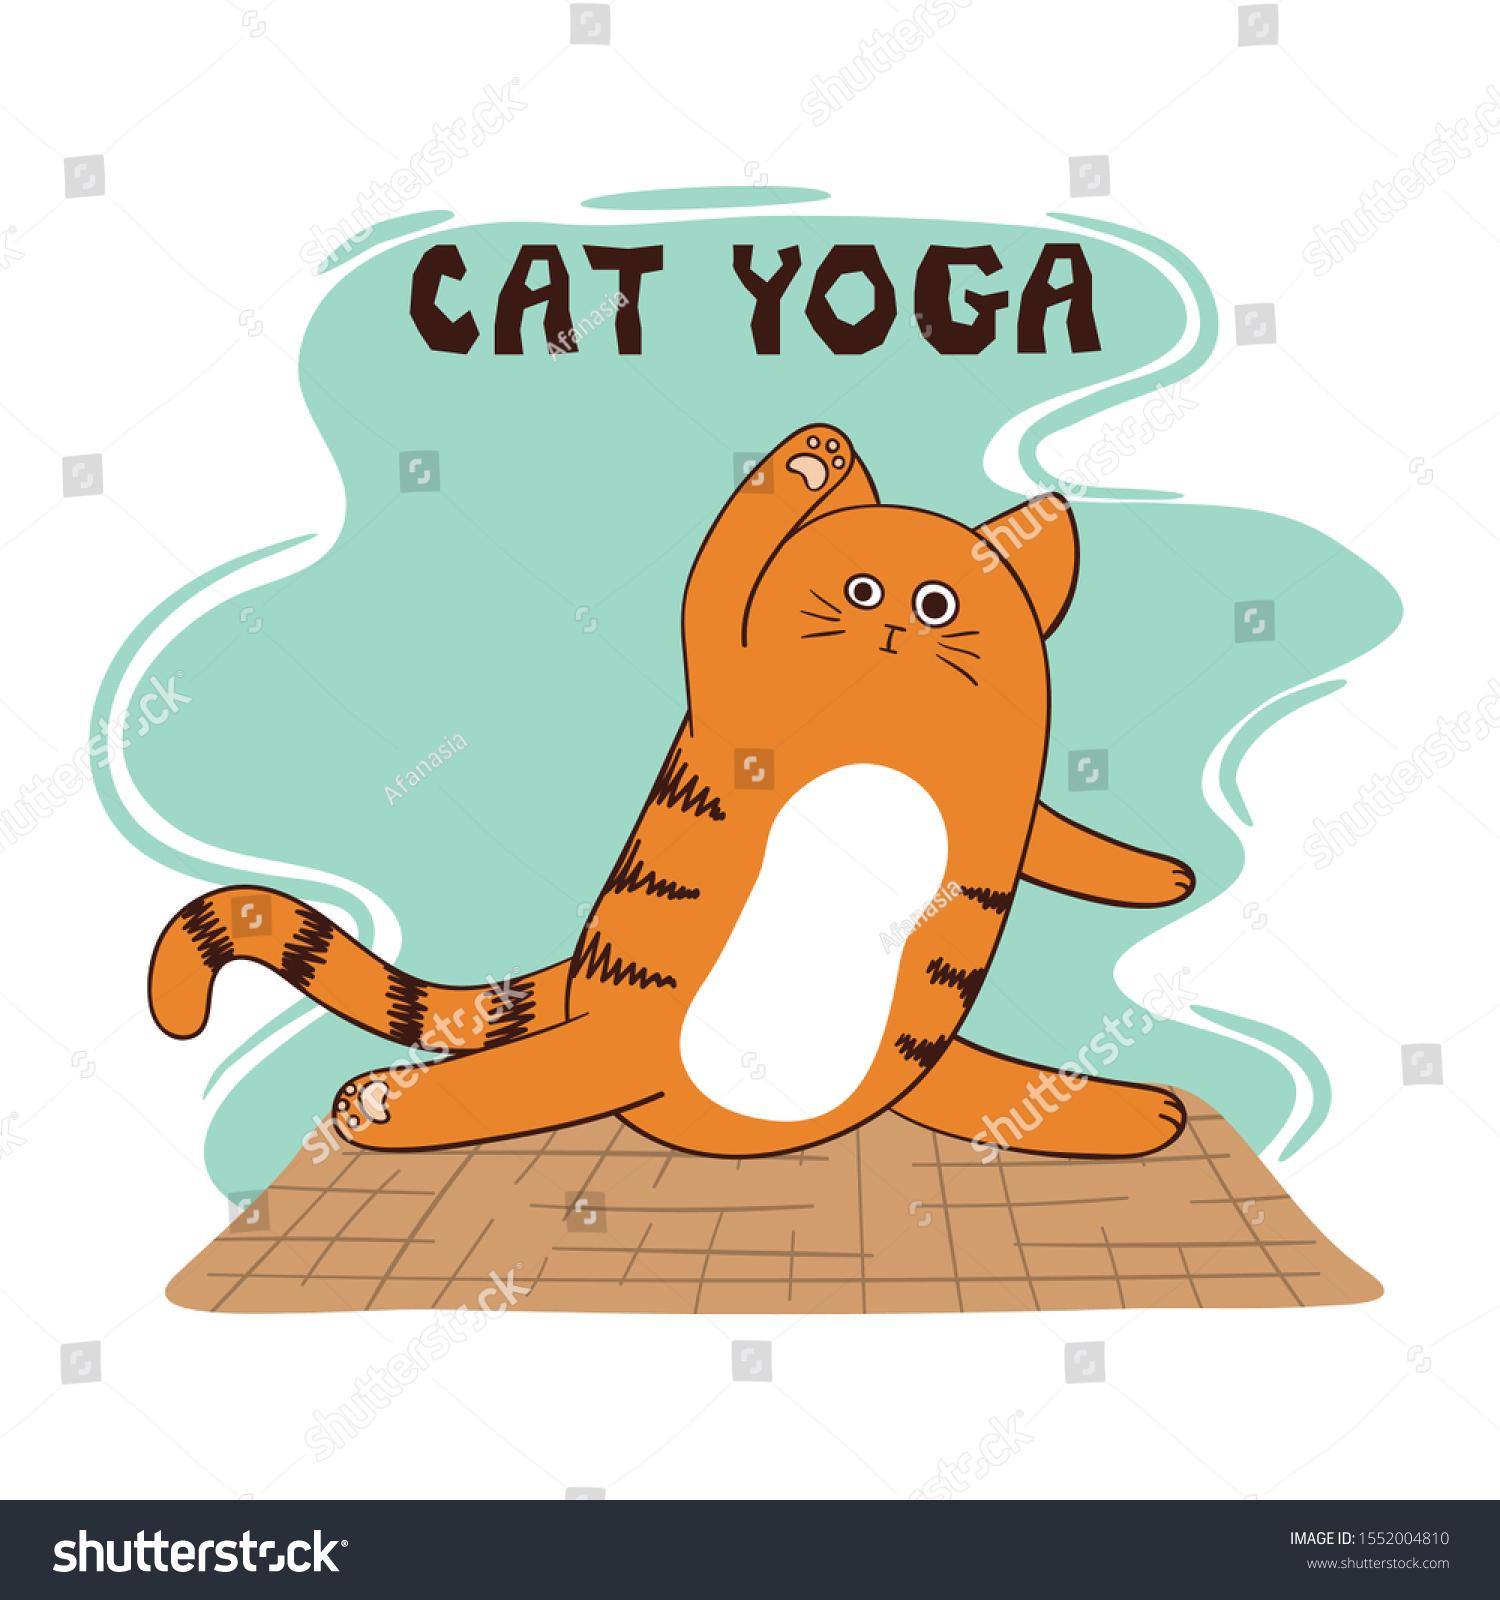 Cartoon Funny Yoga Cat Vector Illustration Stock Vector Royalty Free 1552004810